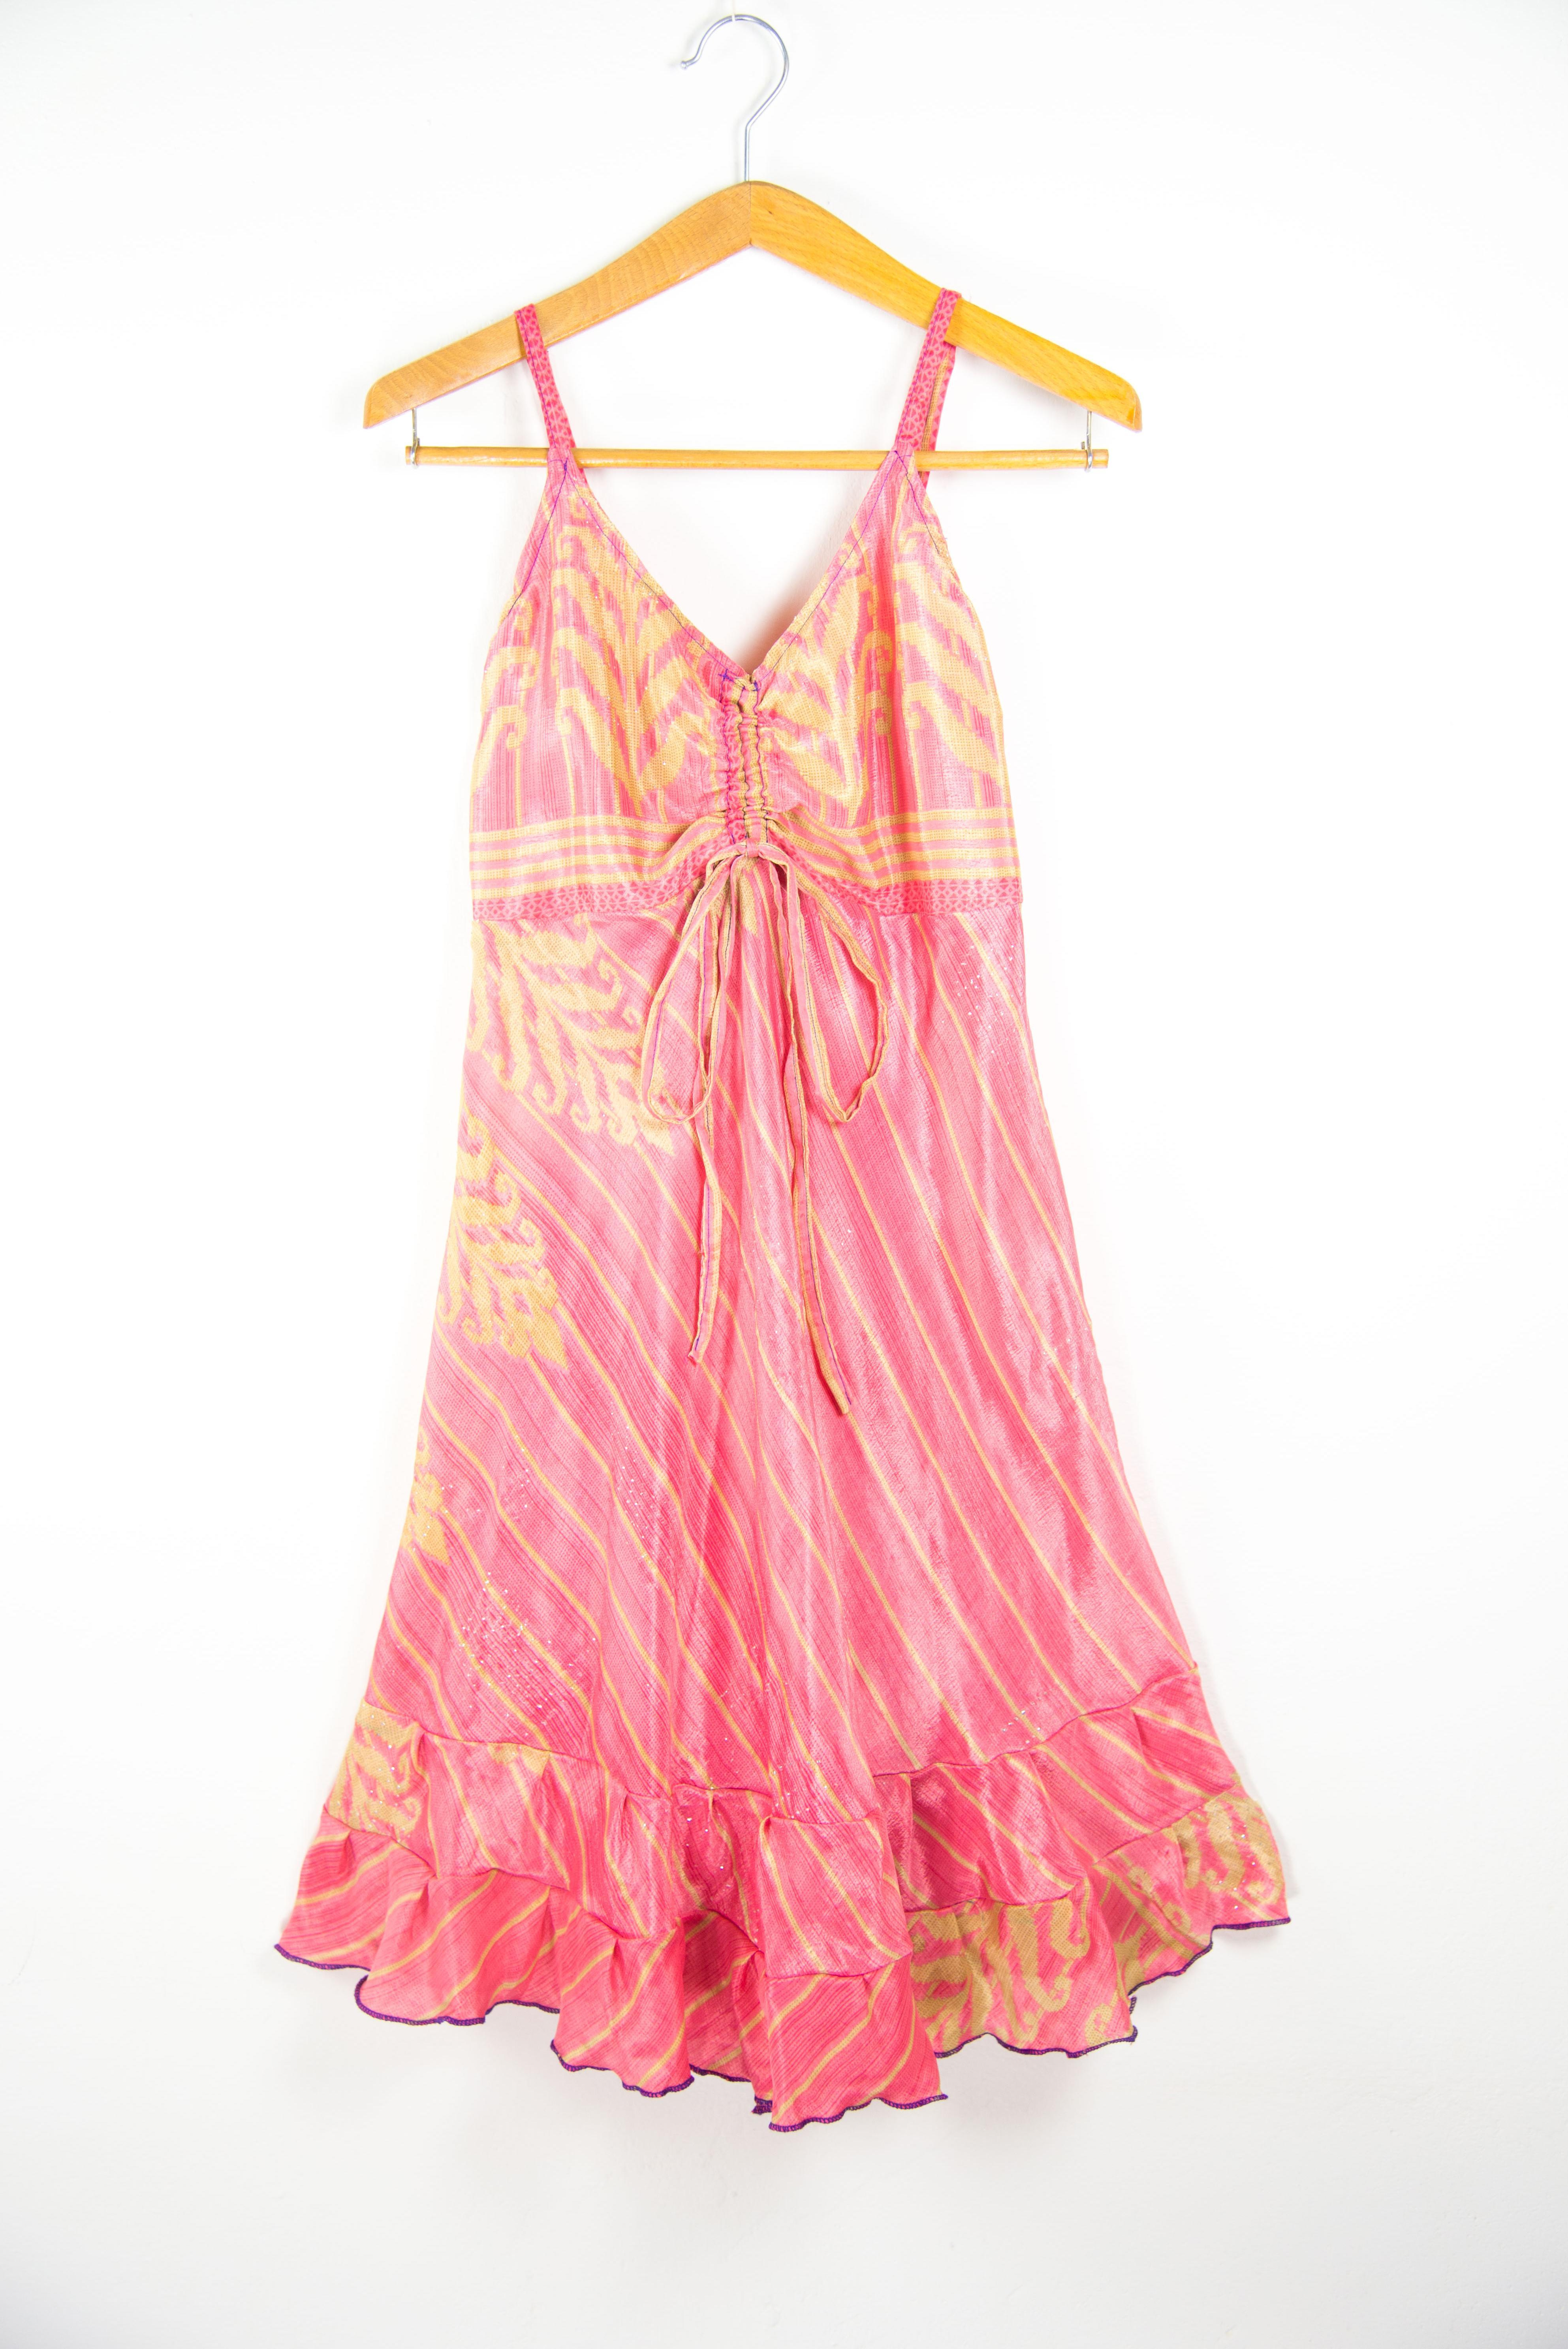 Summer Sleeveless Adjustable Strap dress | Summer clothing online